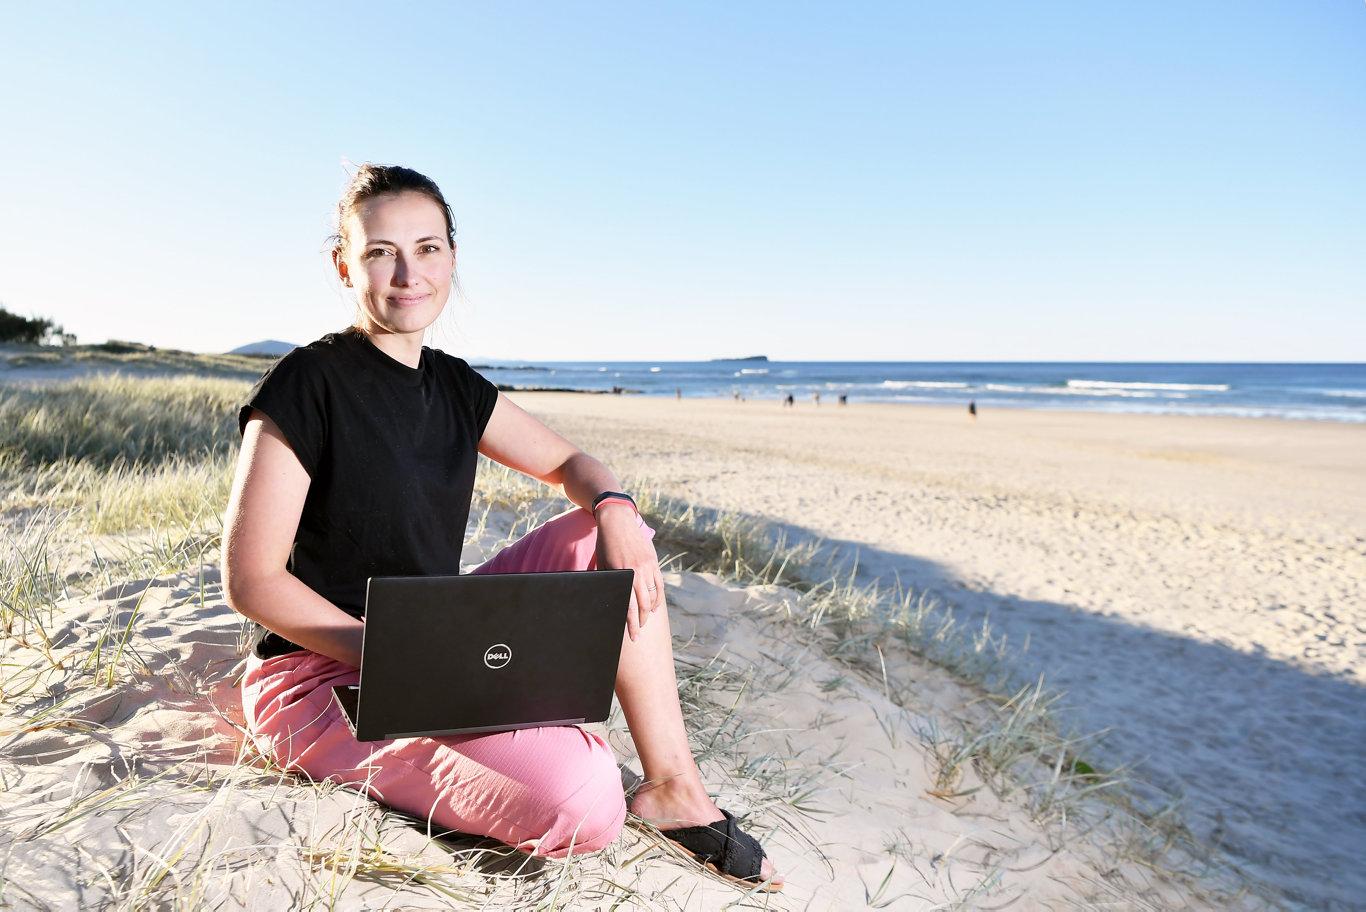 Sunshine Coast Daily's new editor, Nadja Fleet. Photo Patrick Woods / Sunshine Coast Daily.